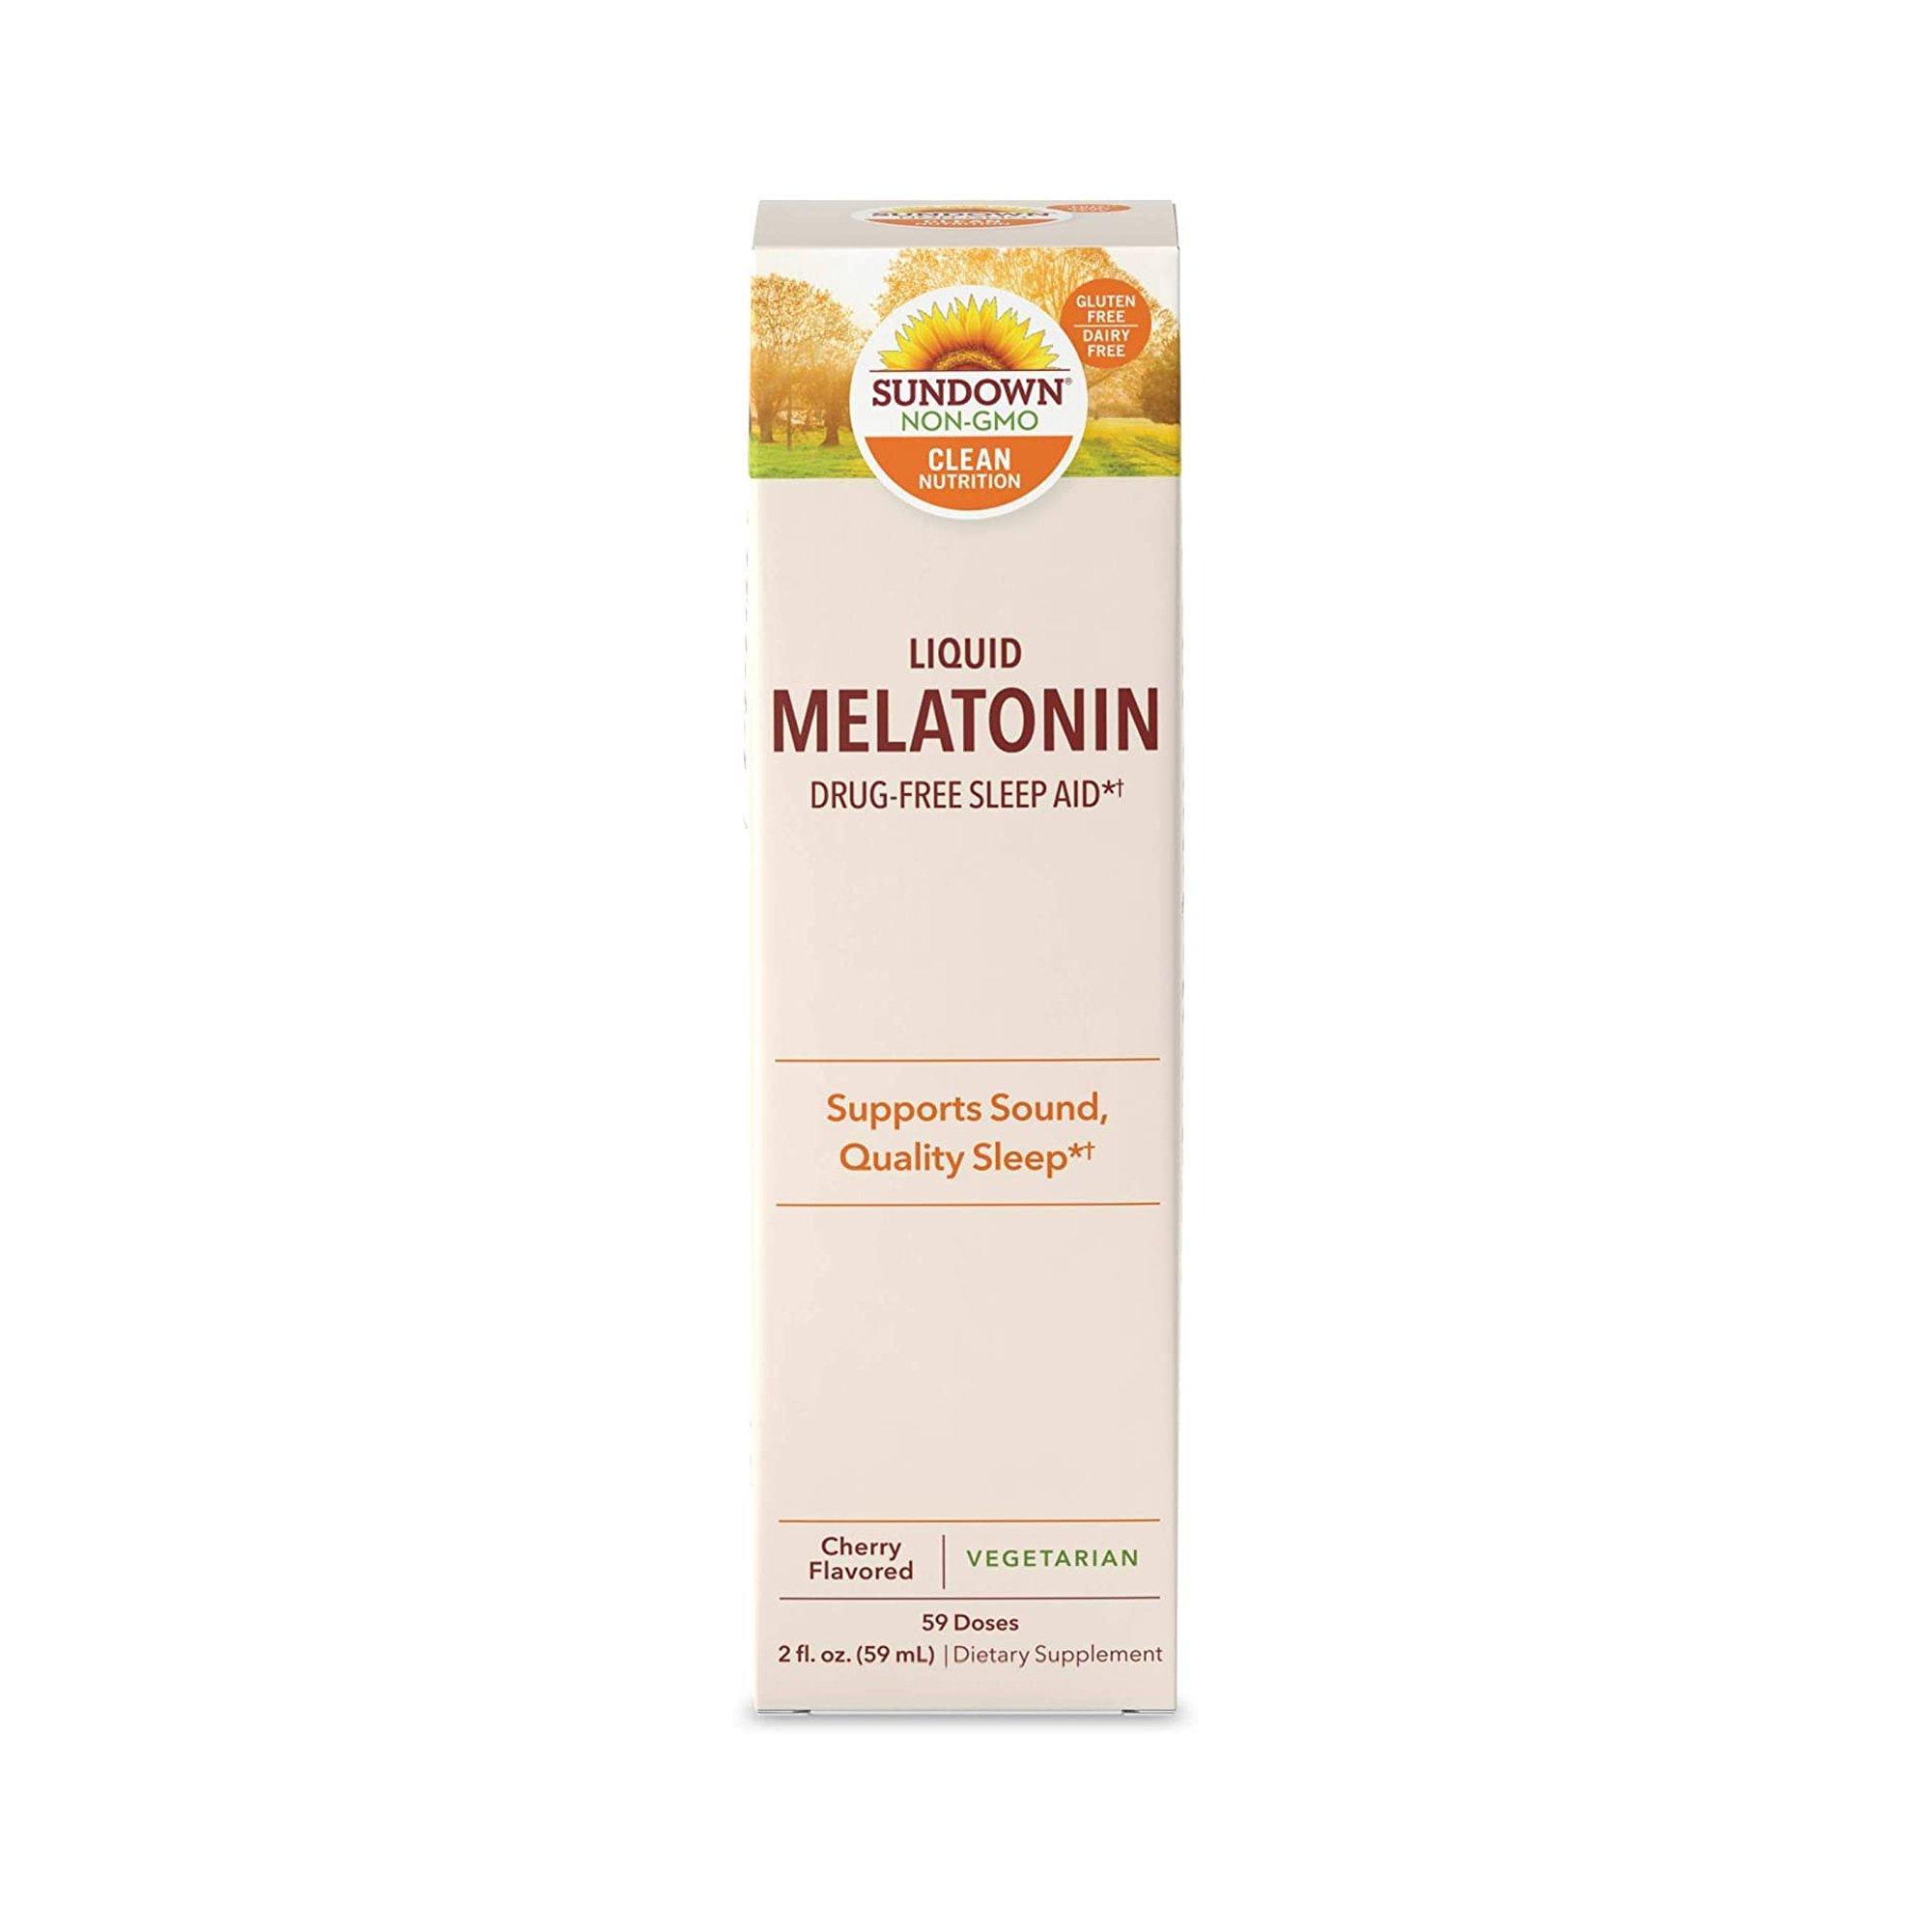 Sundown Liquid Melatonin Drug-Free Sleep Aid, Cherry Flavor, 2 oz., 03076816836, 1 Each